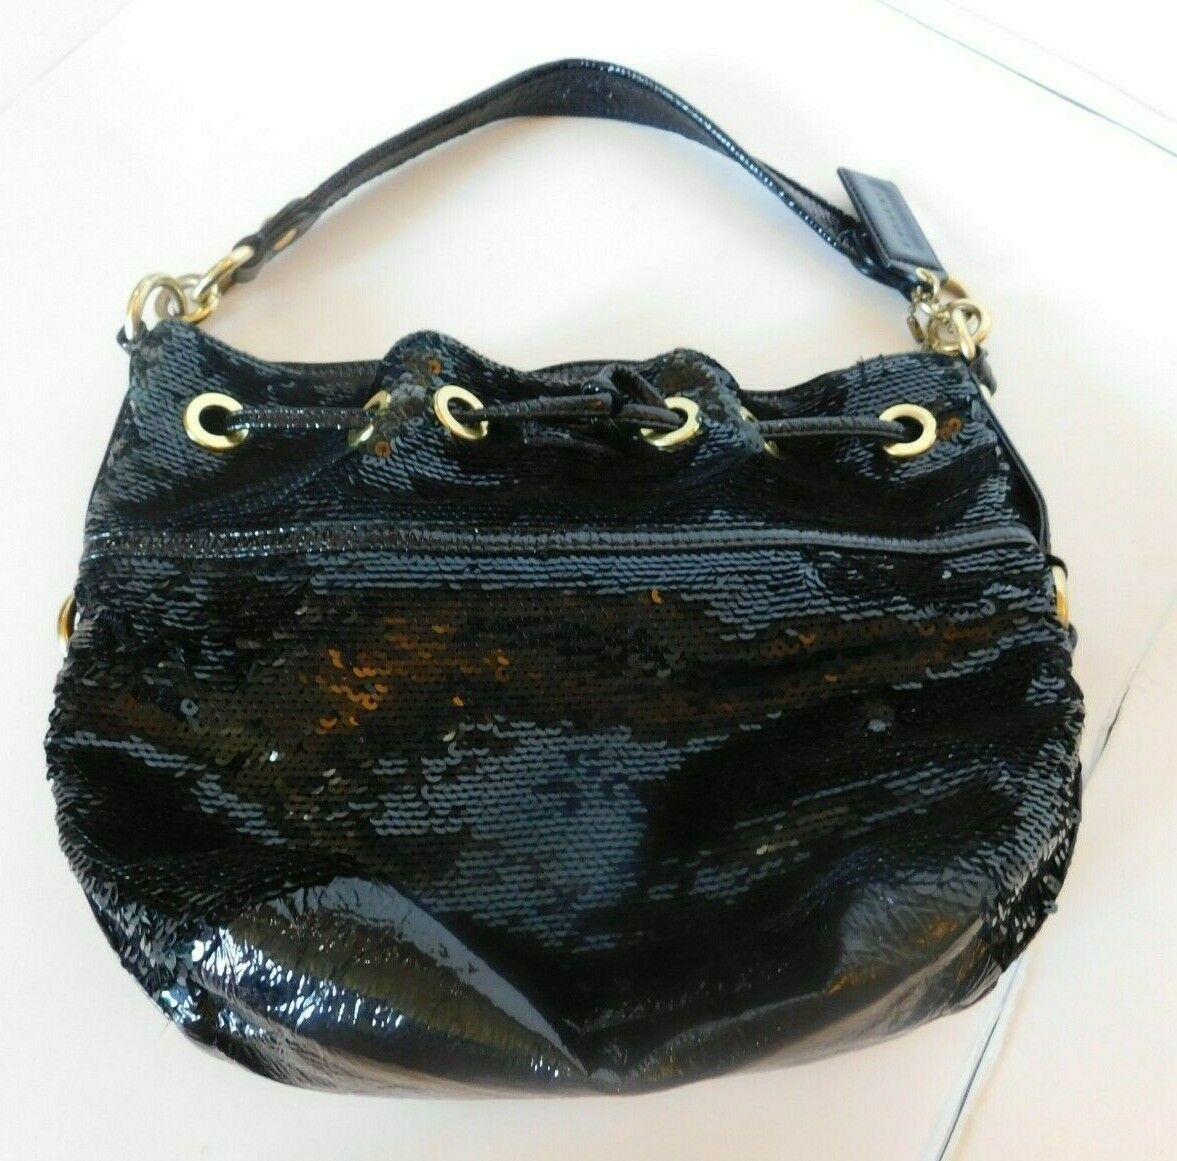 Coach Poppy Black Sequins Drawstring  Bag 17906 image 5